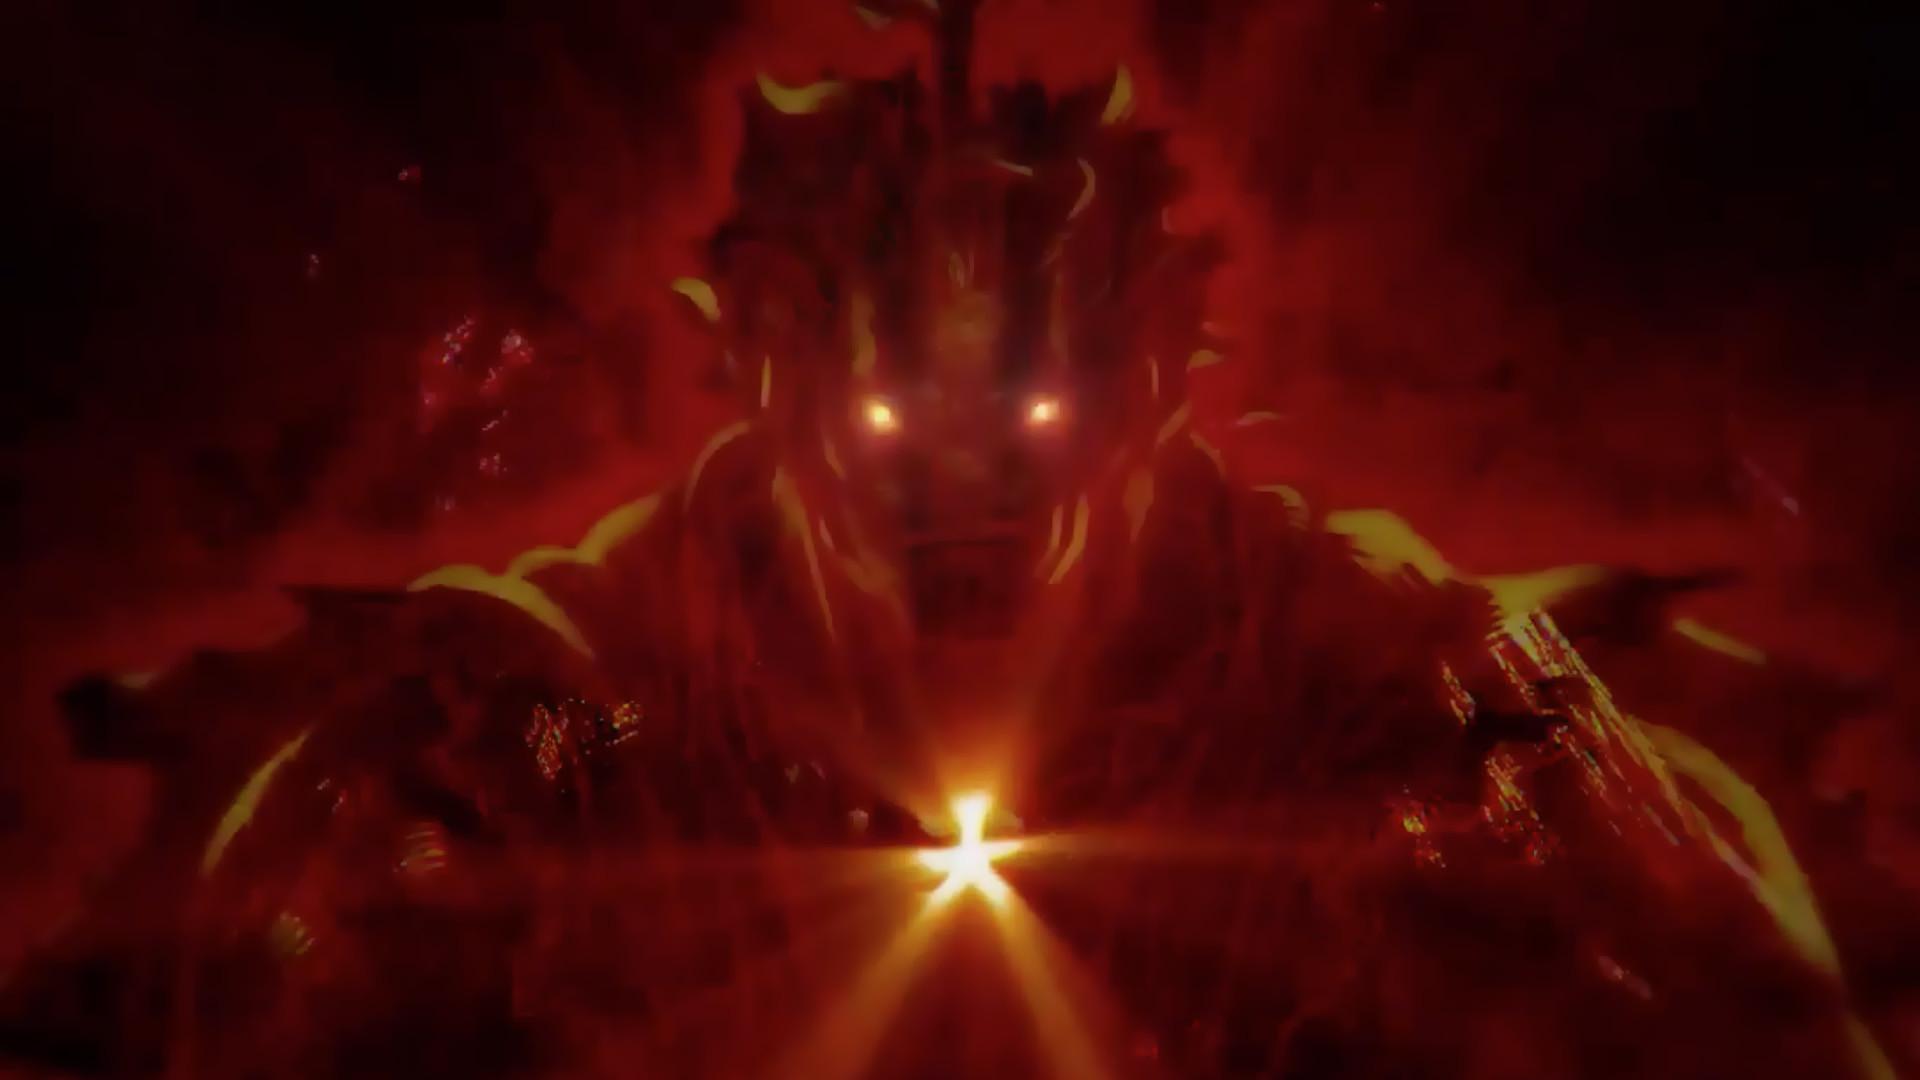 Res: 1920x1080, Capcom reveals how to unlock Shin Akuma in Ultra Street Fighter II |  Nintendo Wire